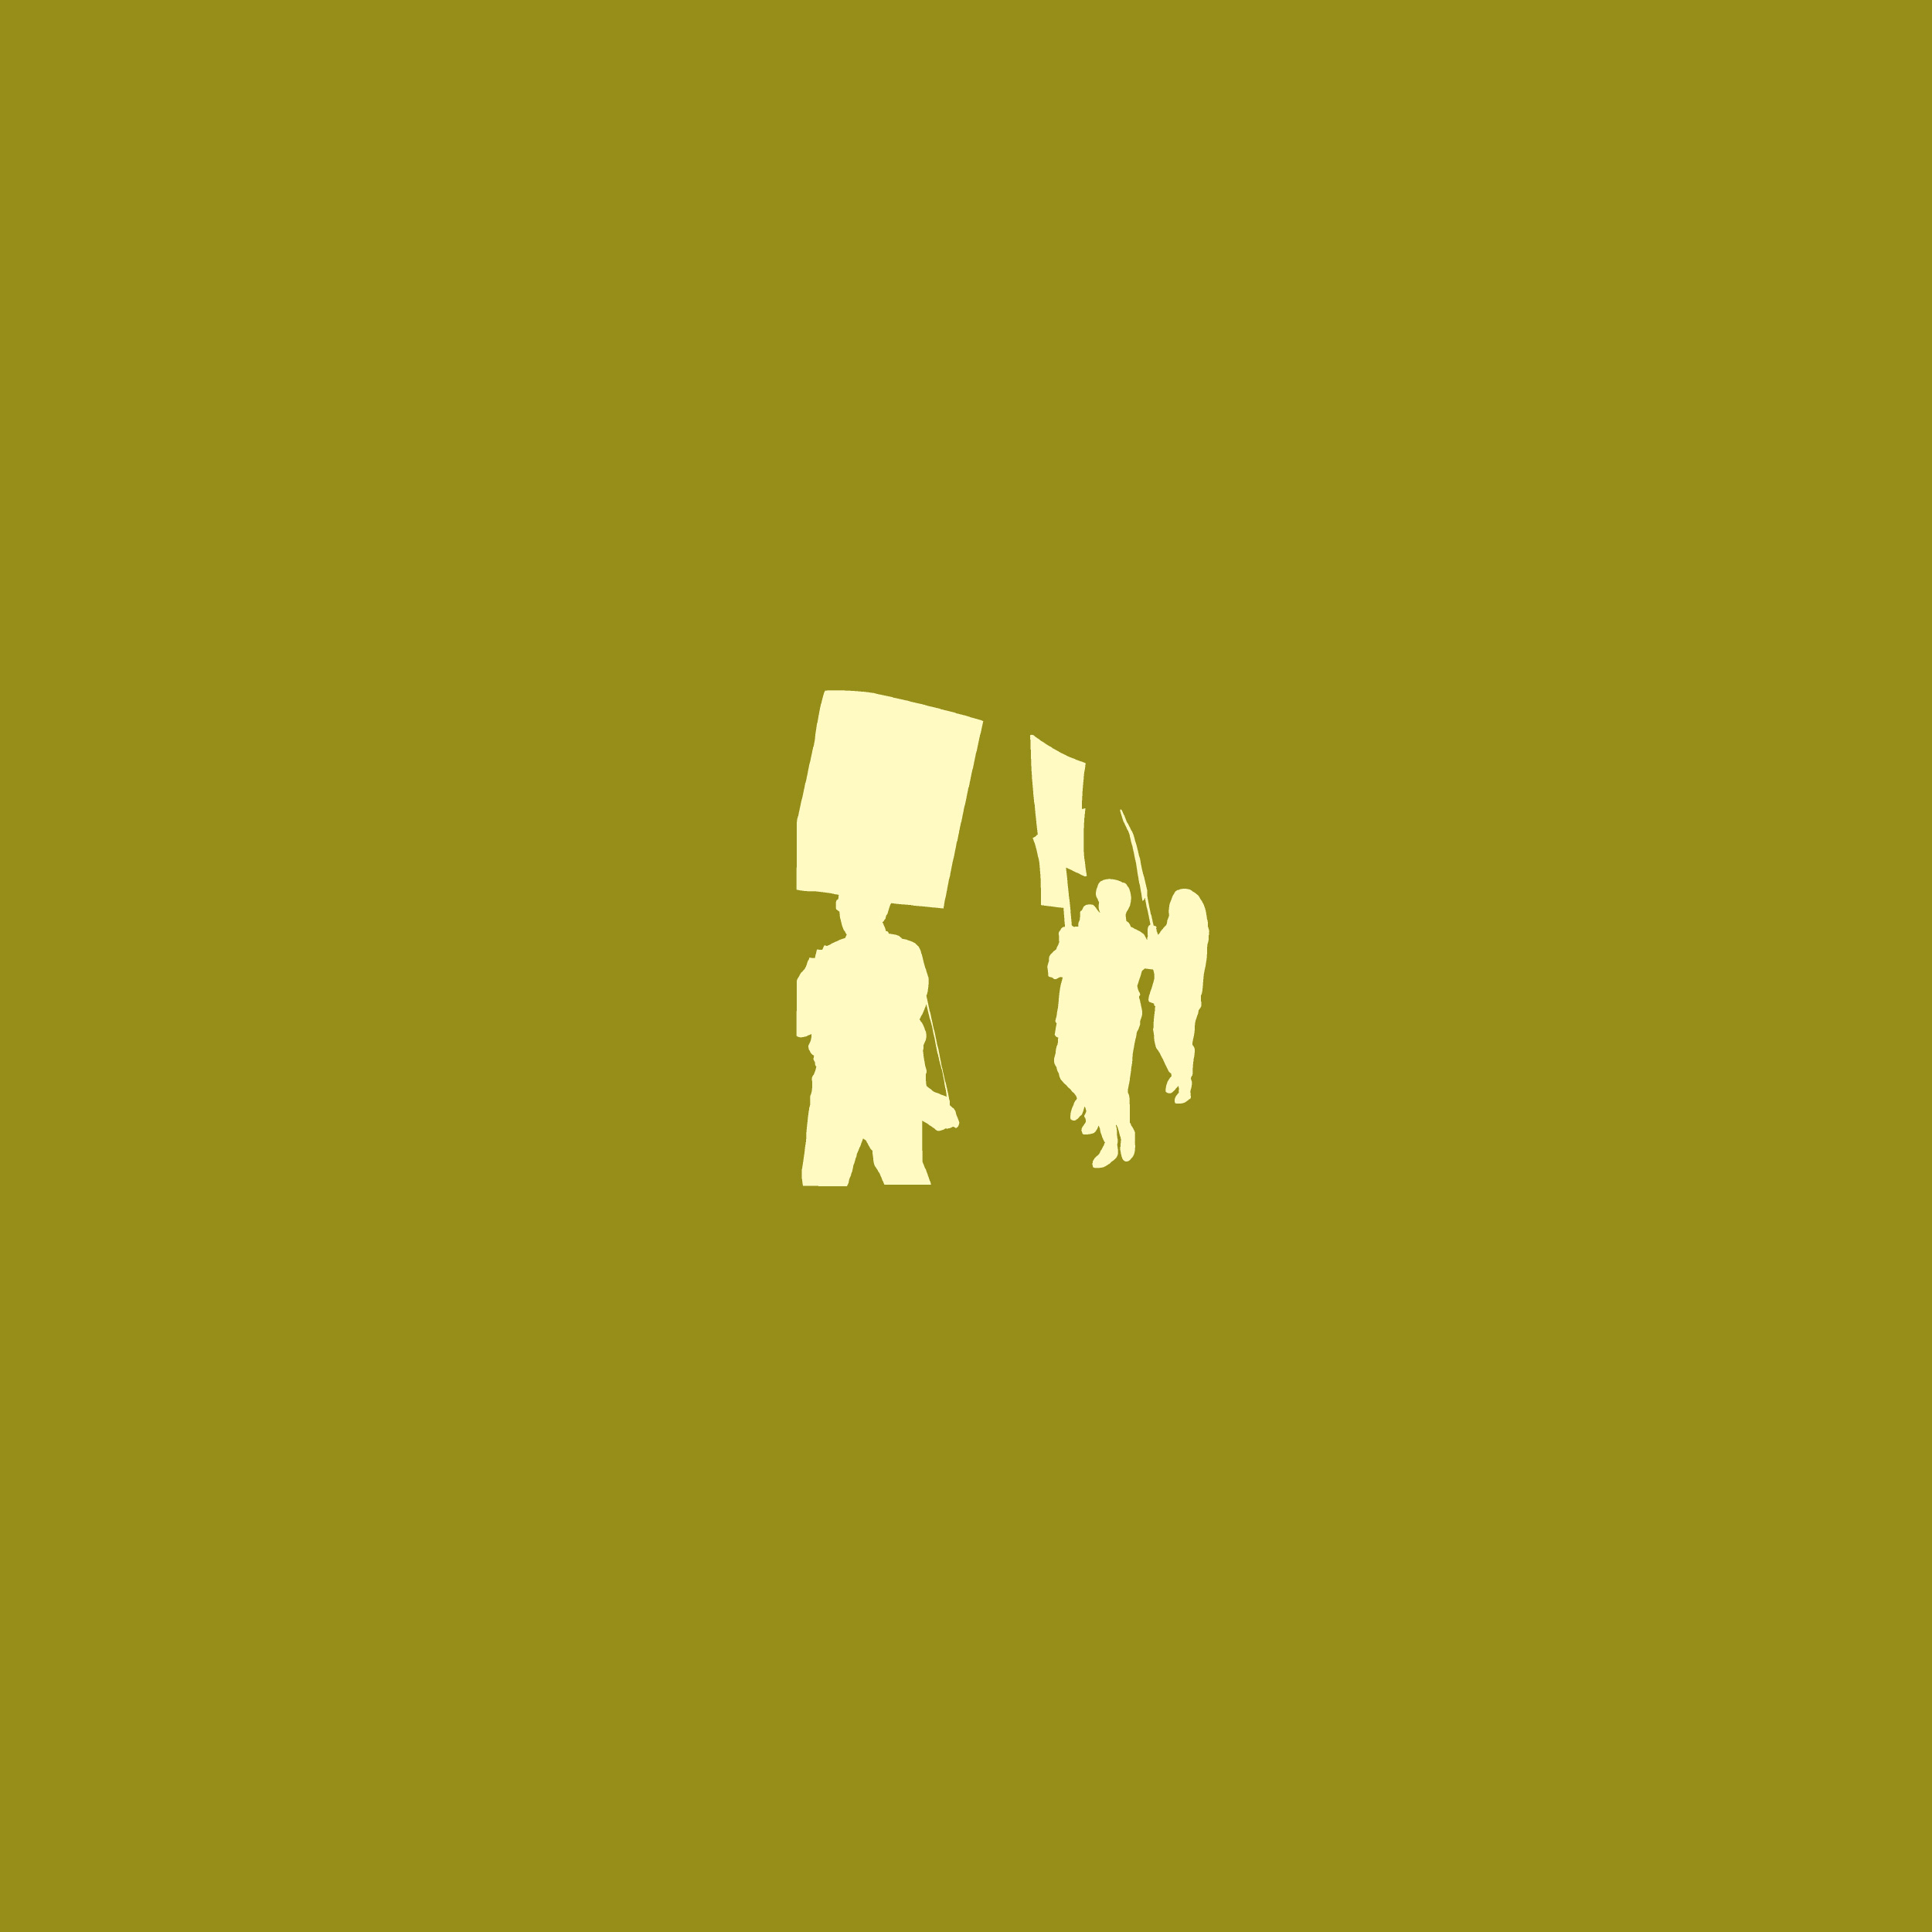 distinc_la_conservancy_people.jpg